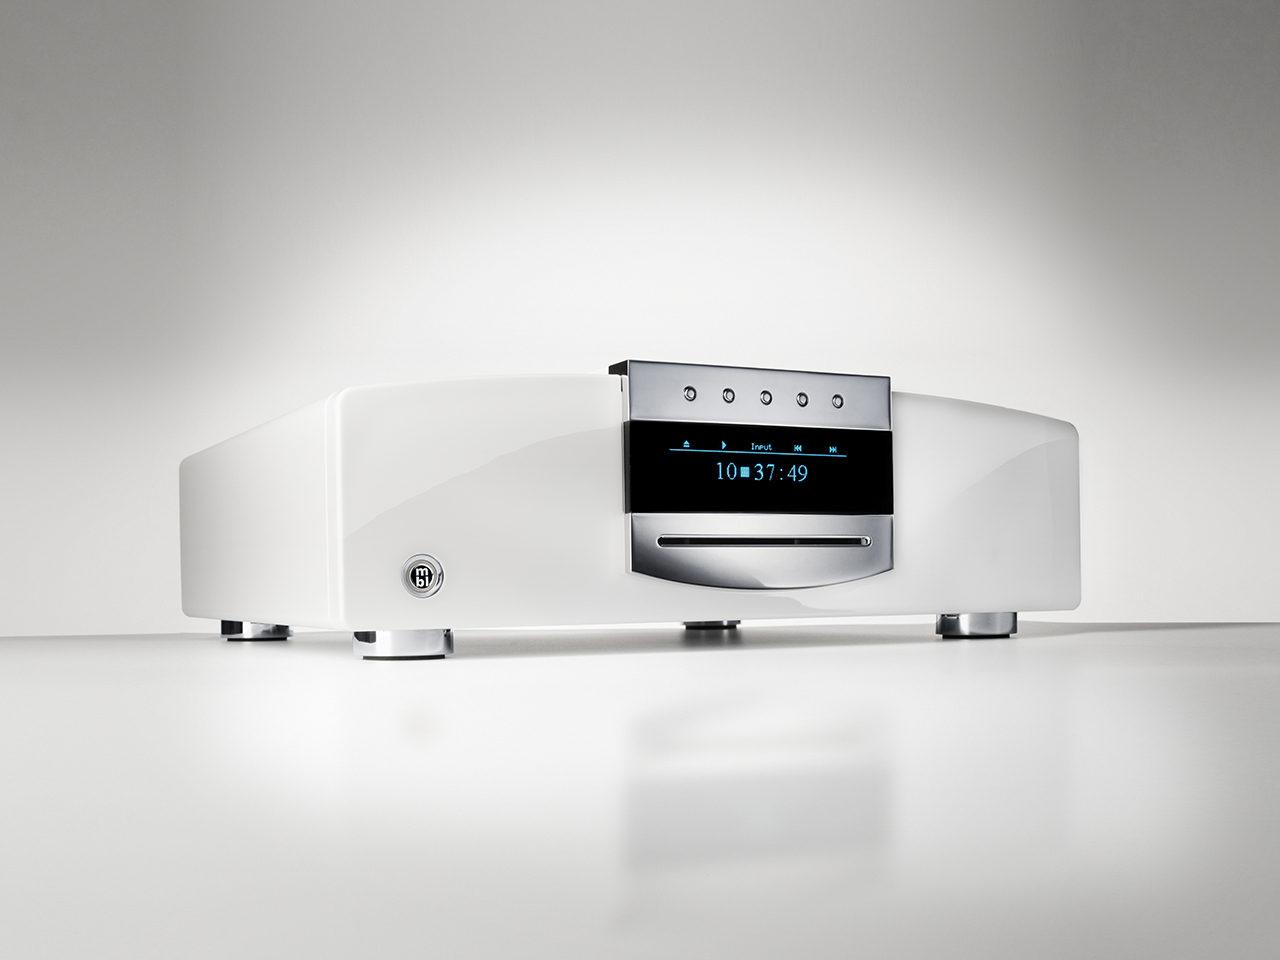 mbl-c31-valkoinen